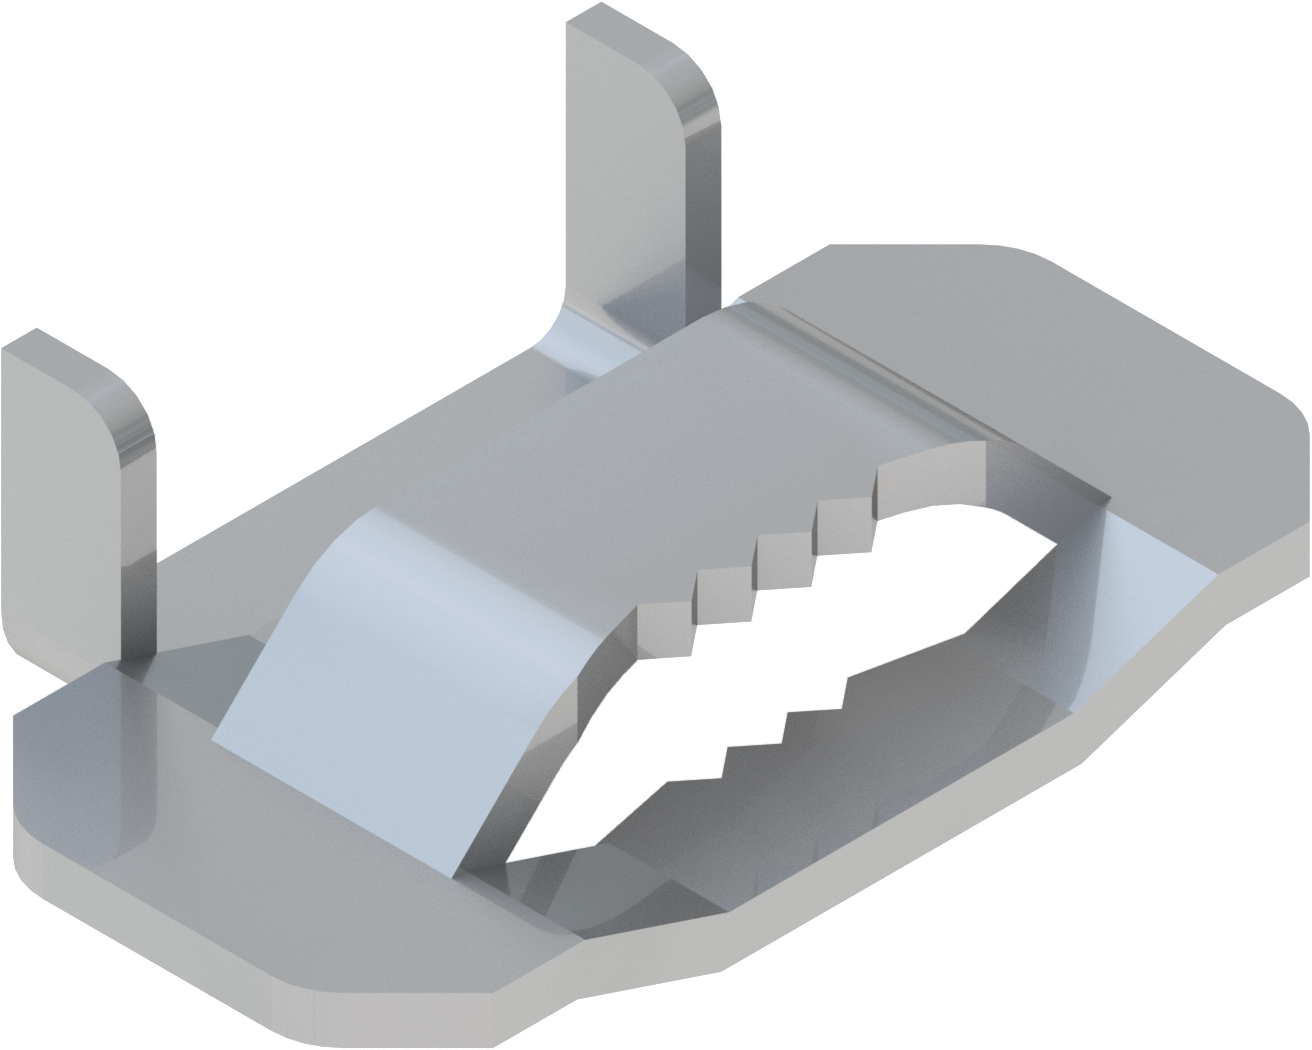 Band-IT klem 3/4 inch (per 100 stuks) C256